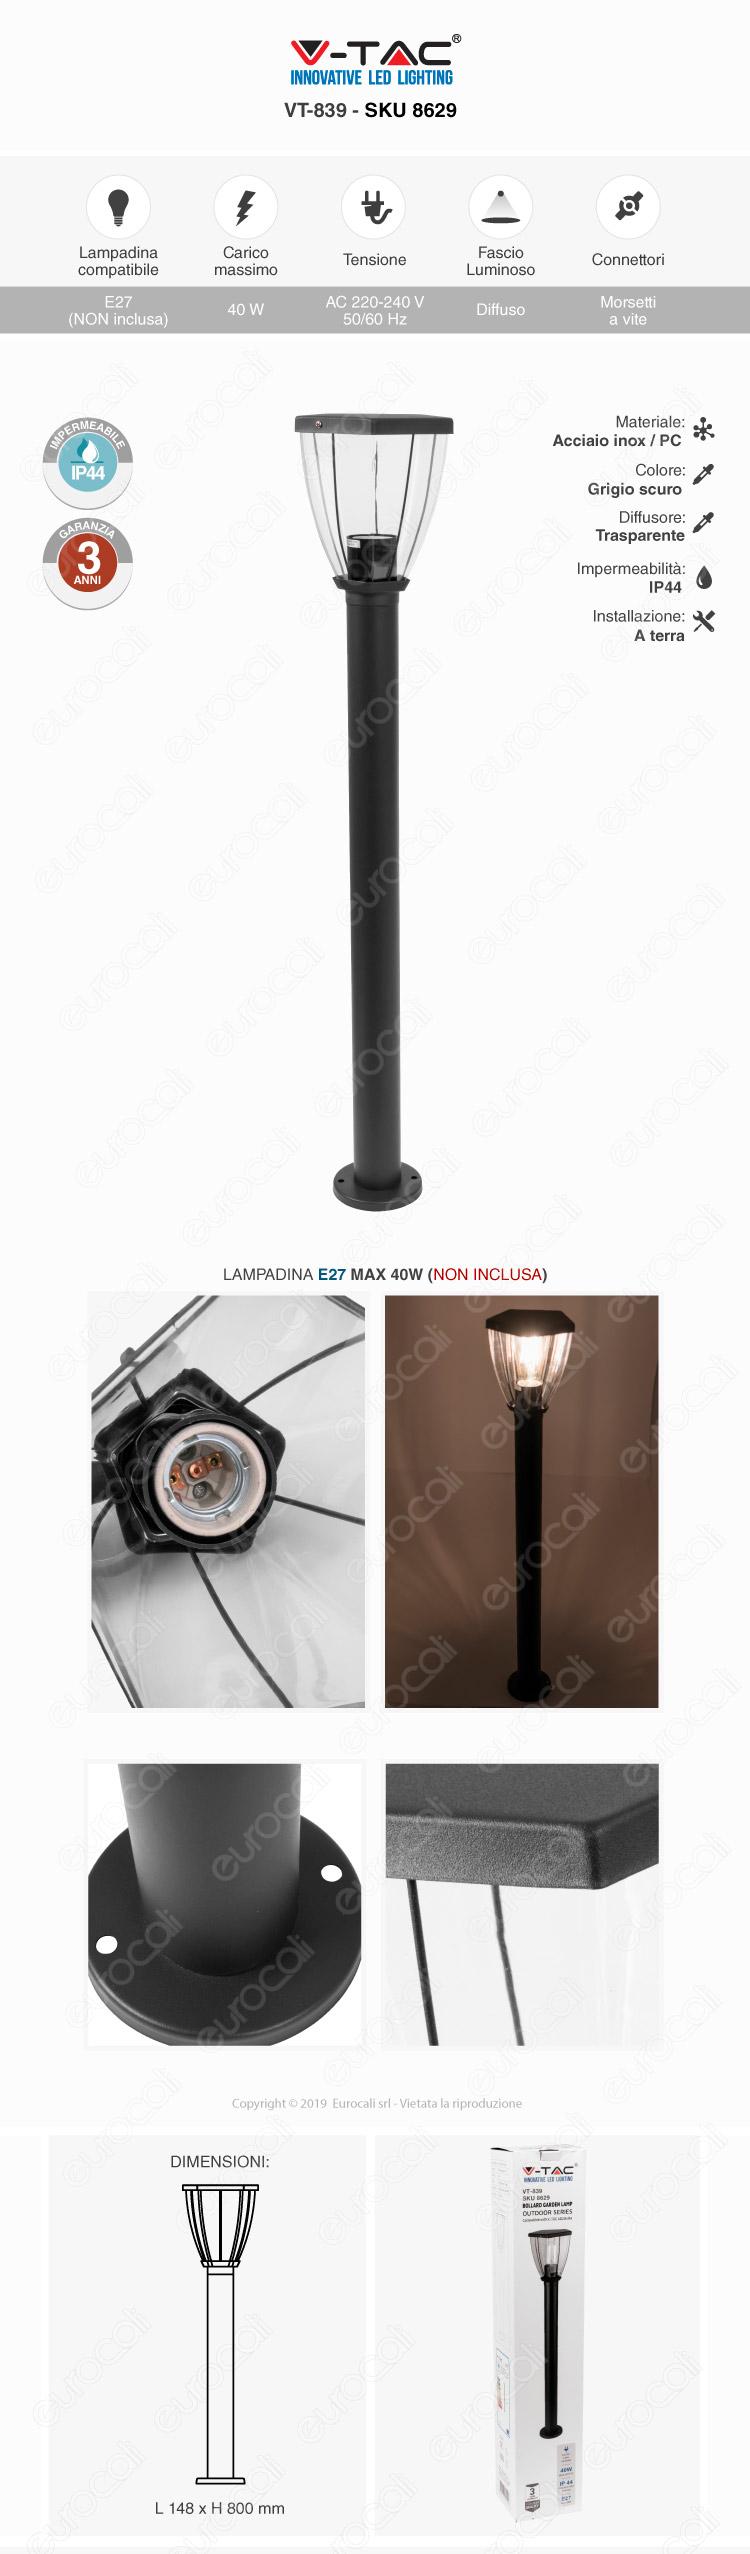 V-Tac VT-839 Lampada da giardino